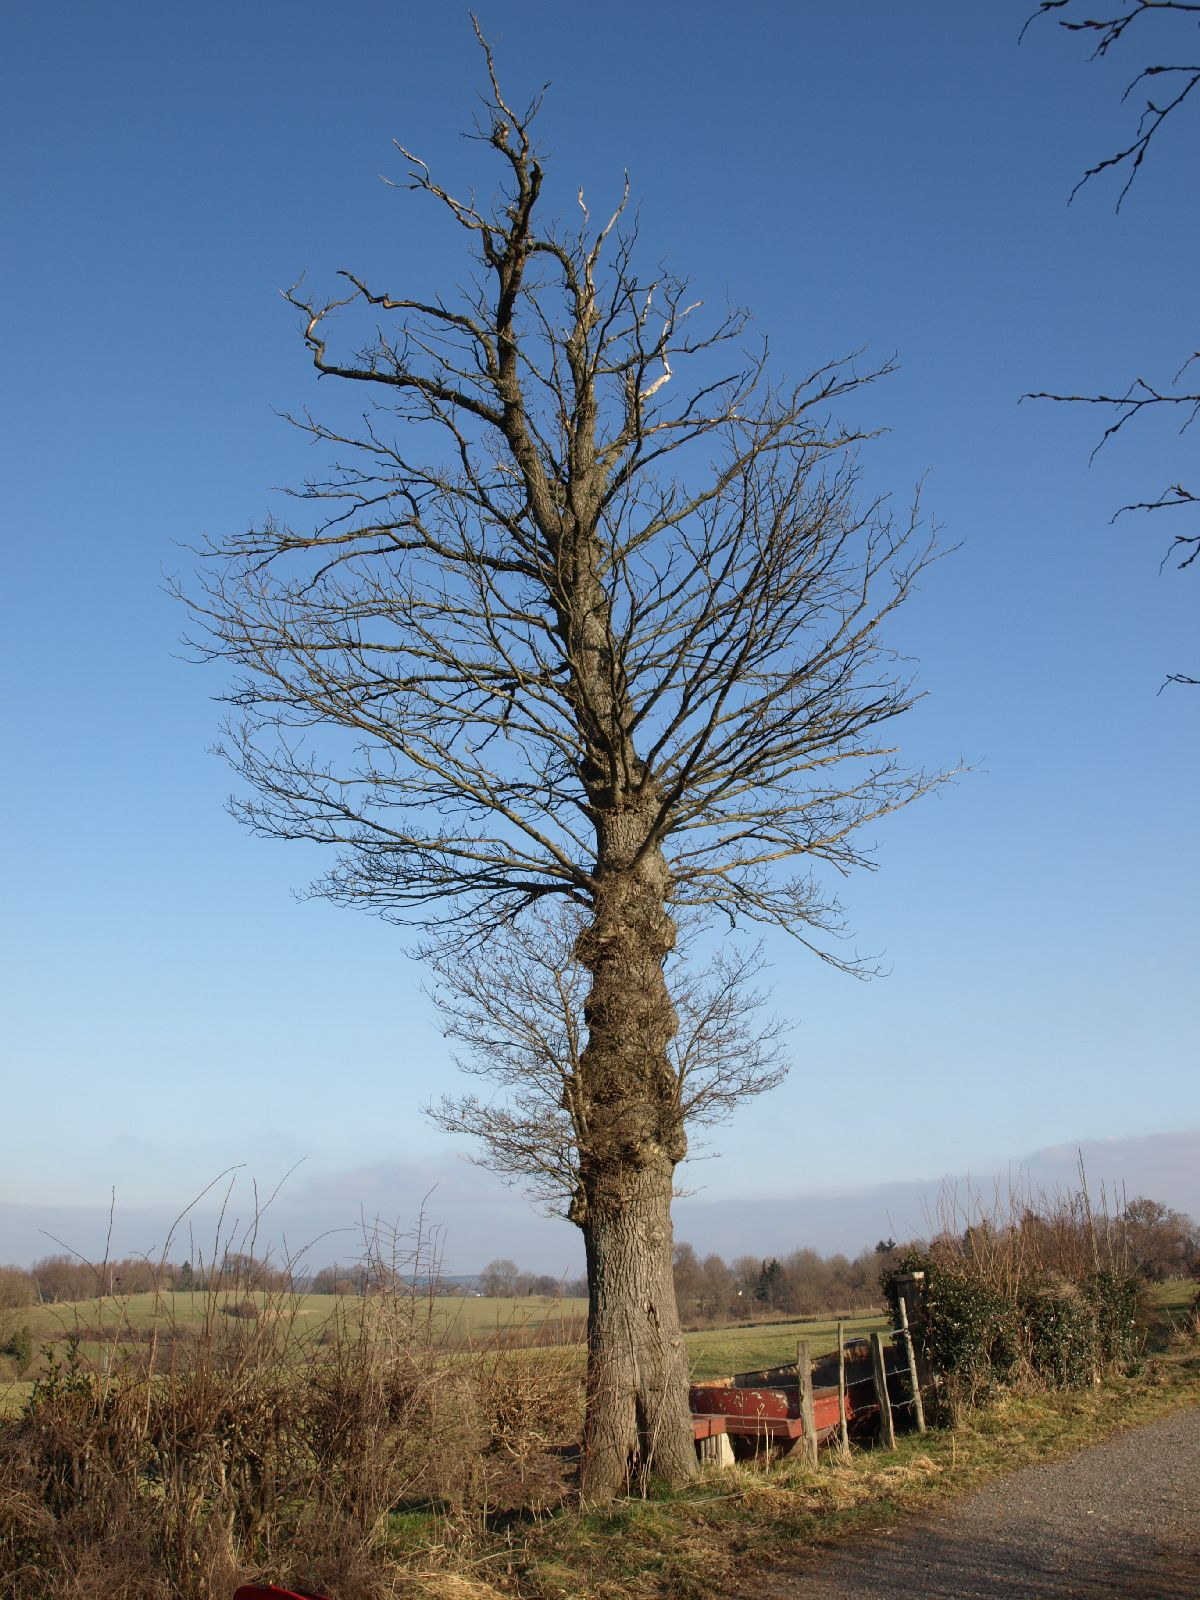 Pflanzen-Baum-Silhouette-Foto_Textur_B_P1310335